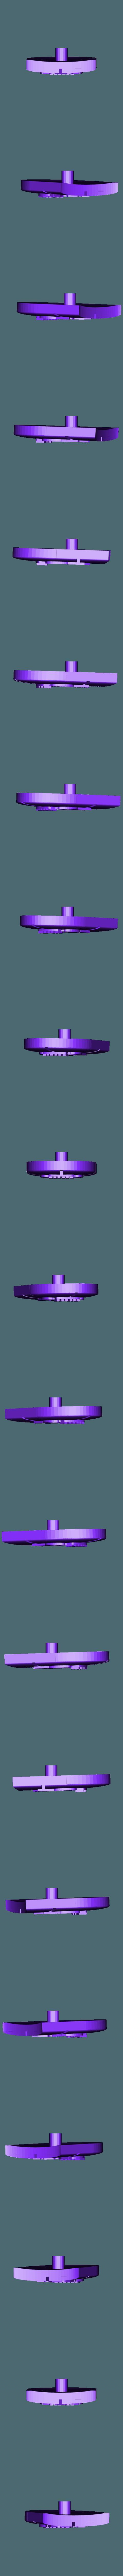 Skull_Shield.stl Download free STL file Modular Linebacker Mech • 3D printing object, mrhers2